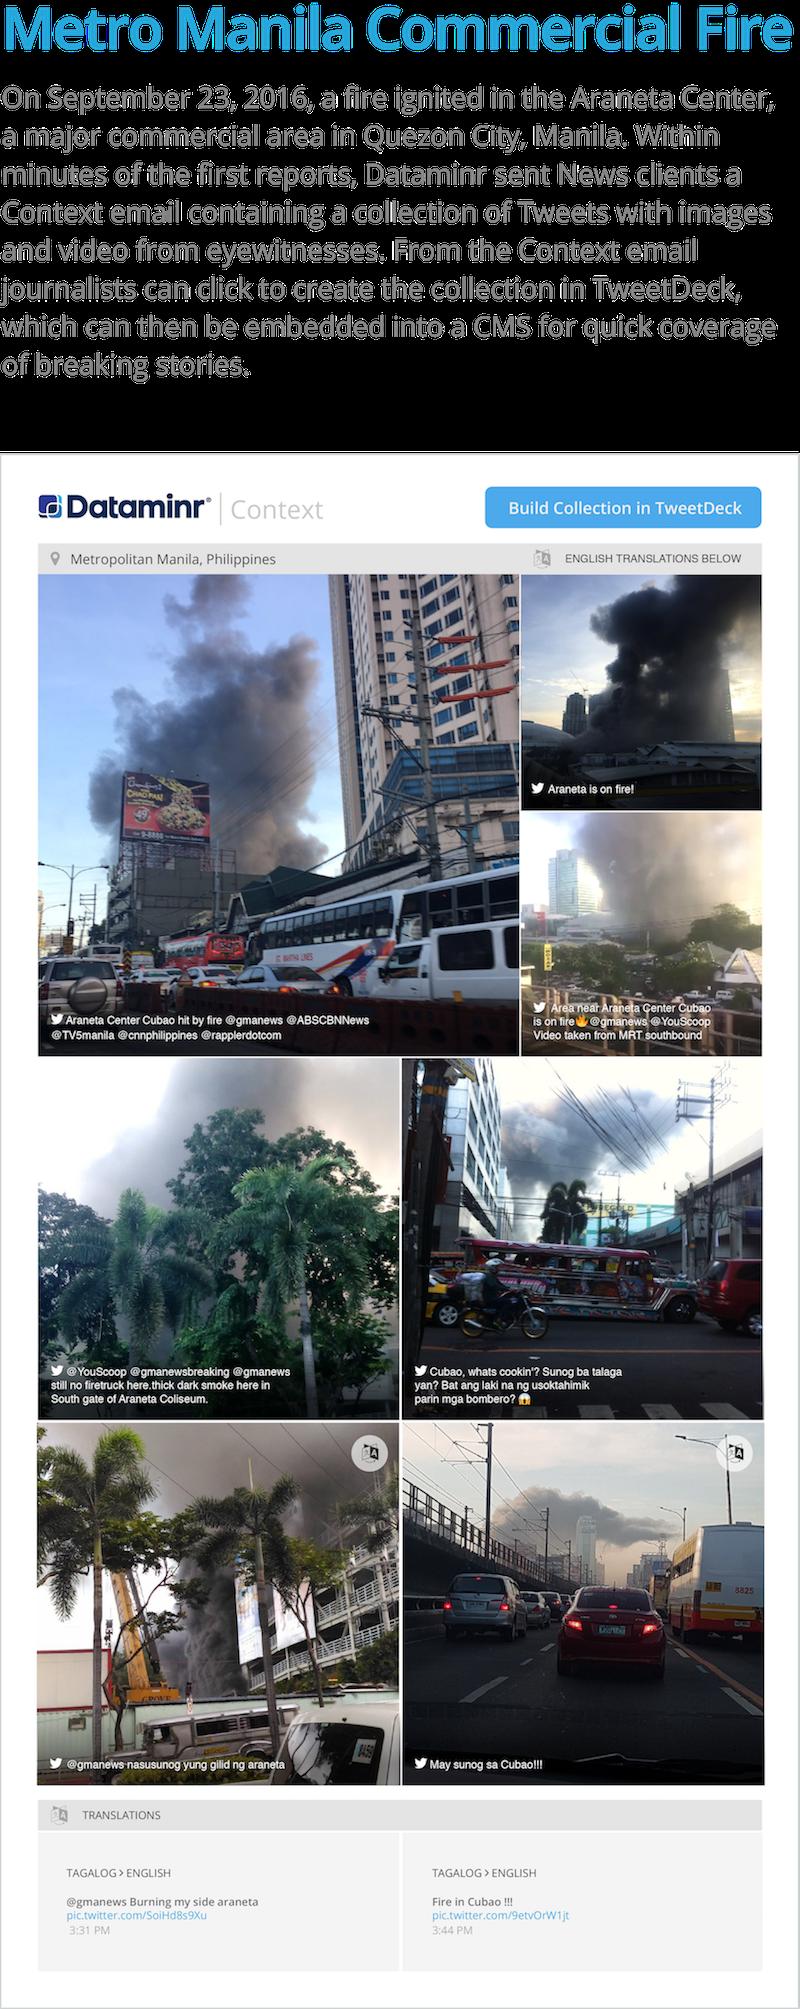 Metro Manila Commercial Fire